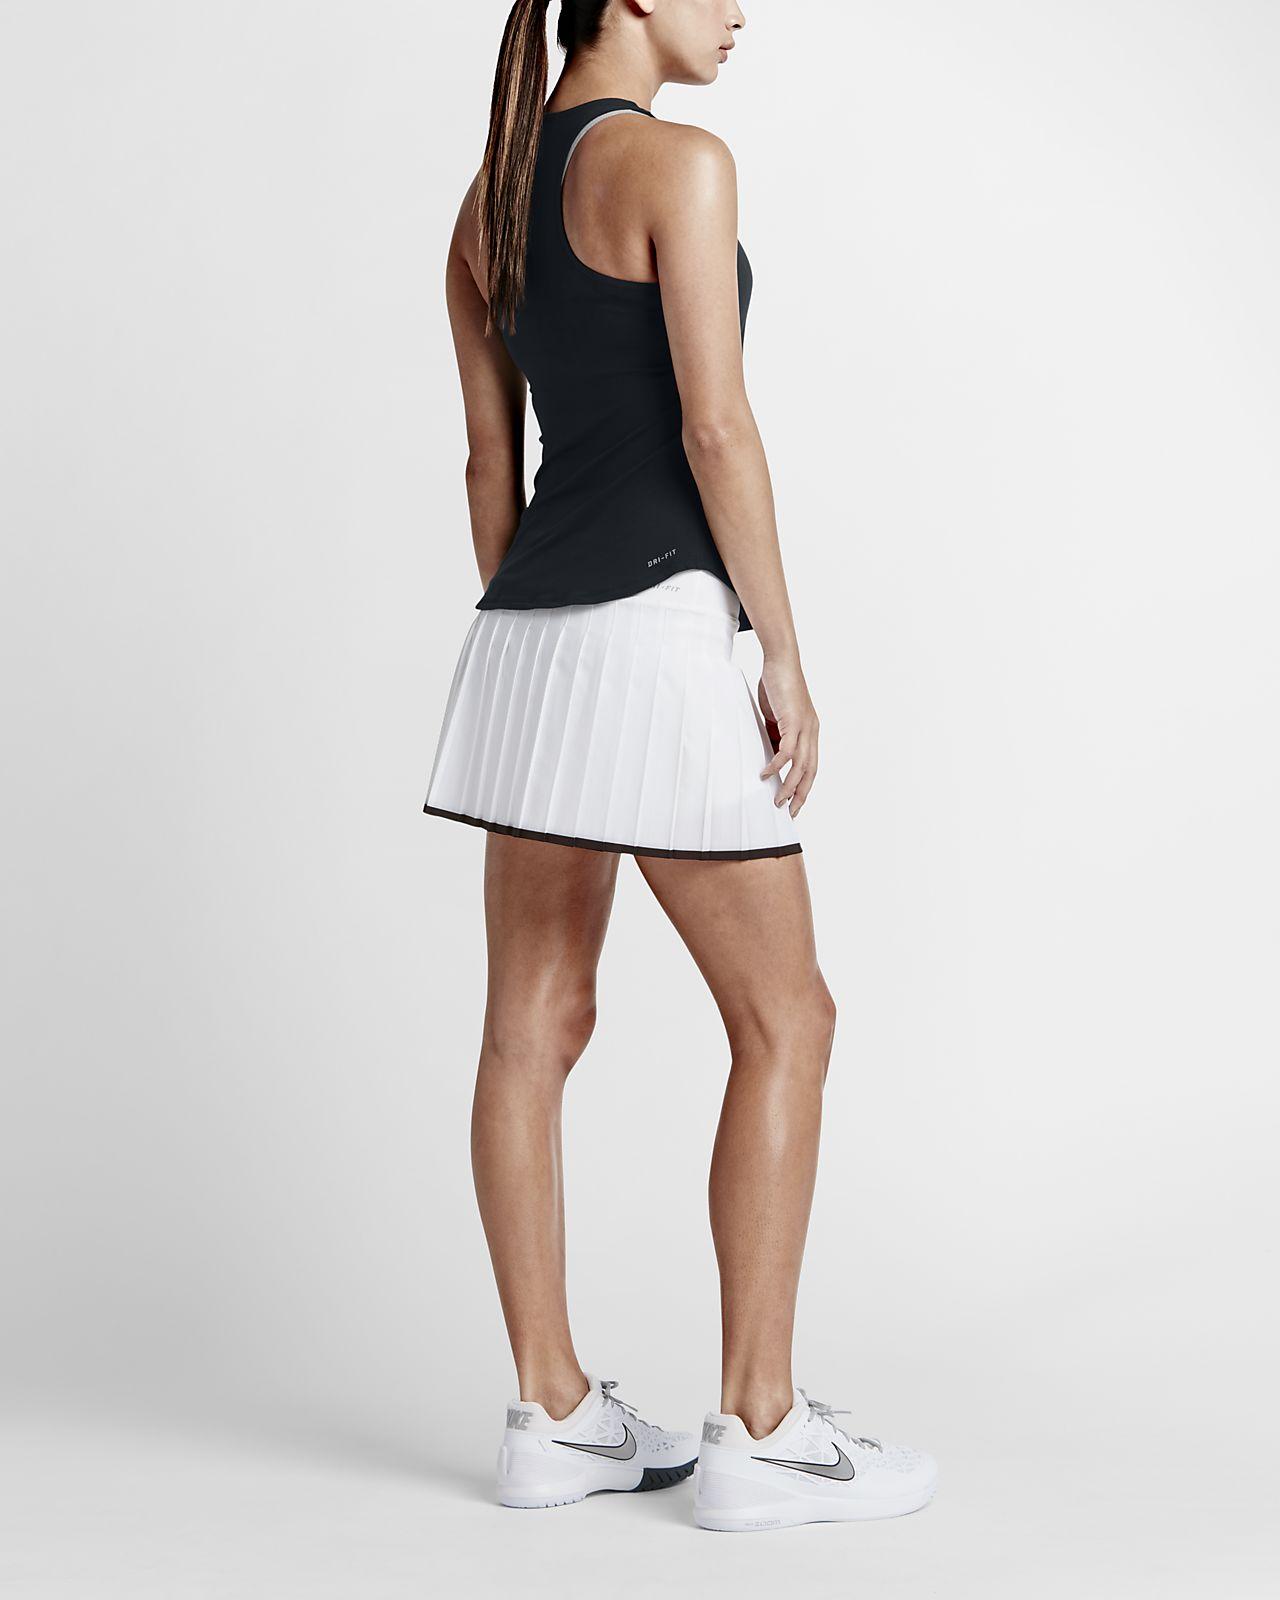 NikeCourt Team Pure Tennistanktop dames